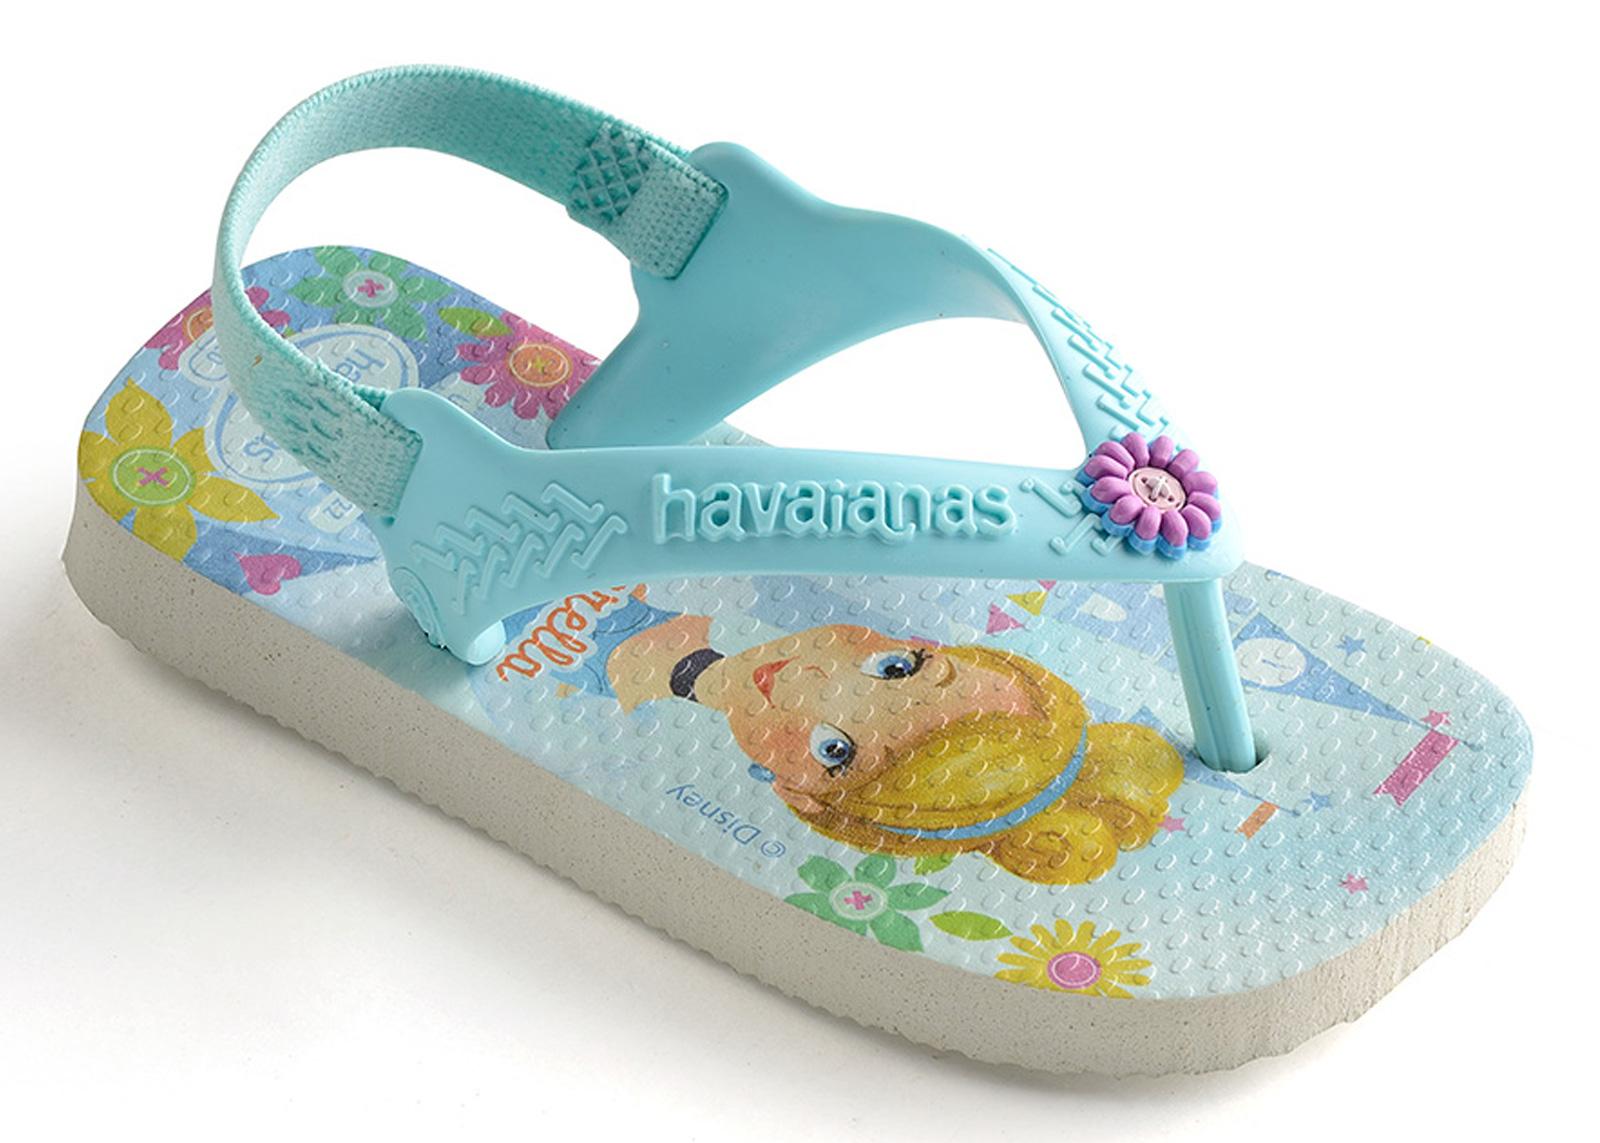 7e4b56aee3a Σανδάλια Baby Disney Princess White-ice Blue - Κατασκευαστές Havaianas